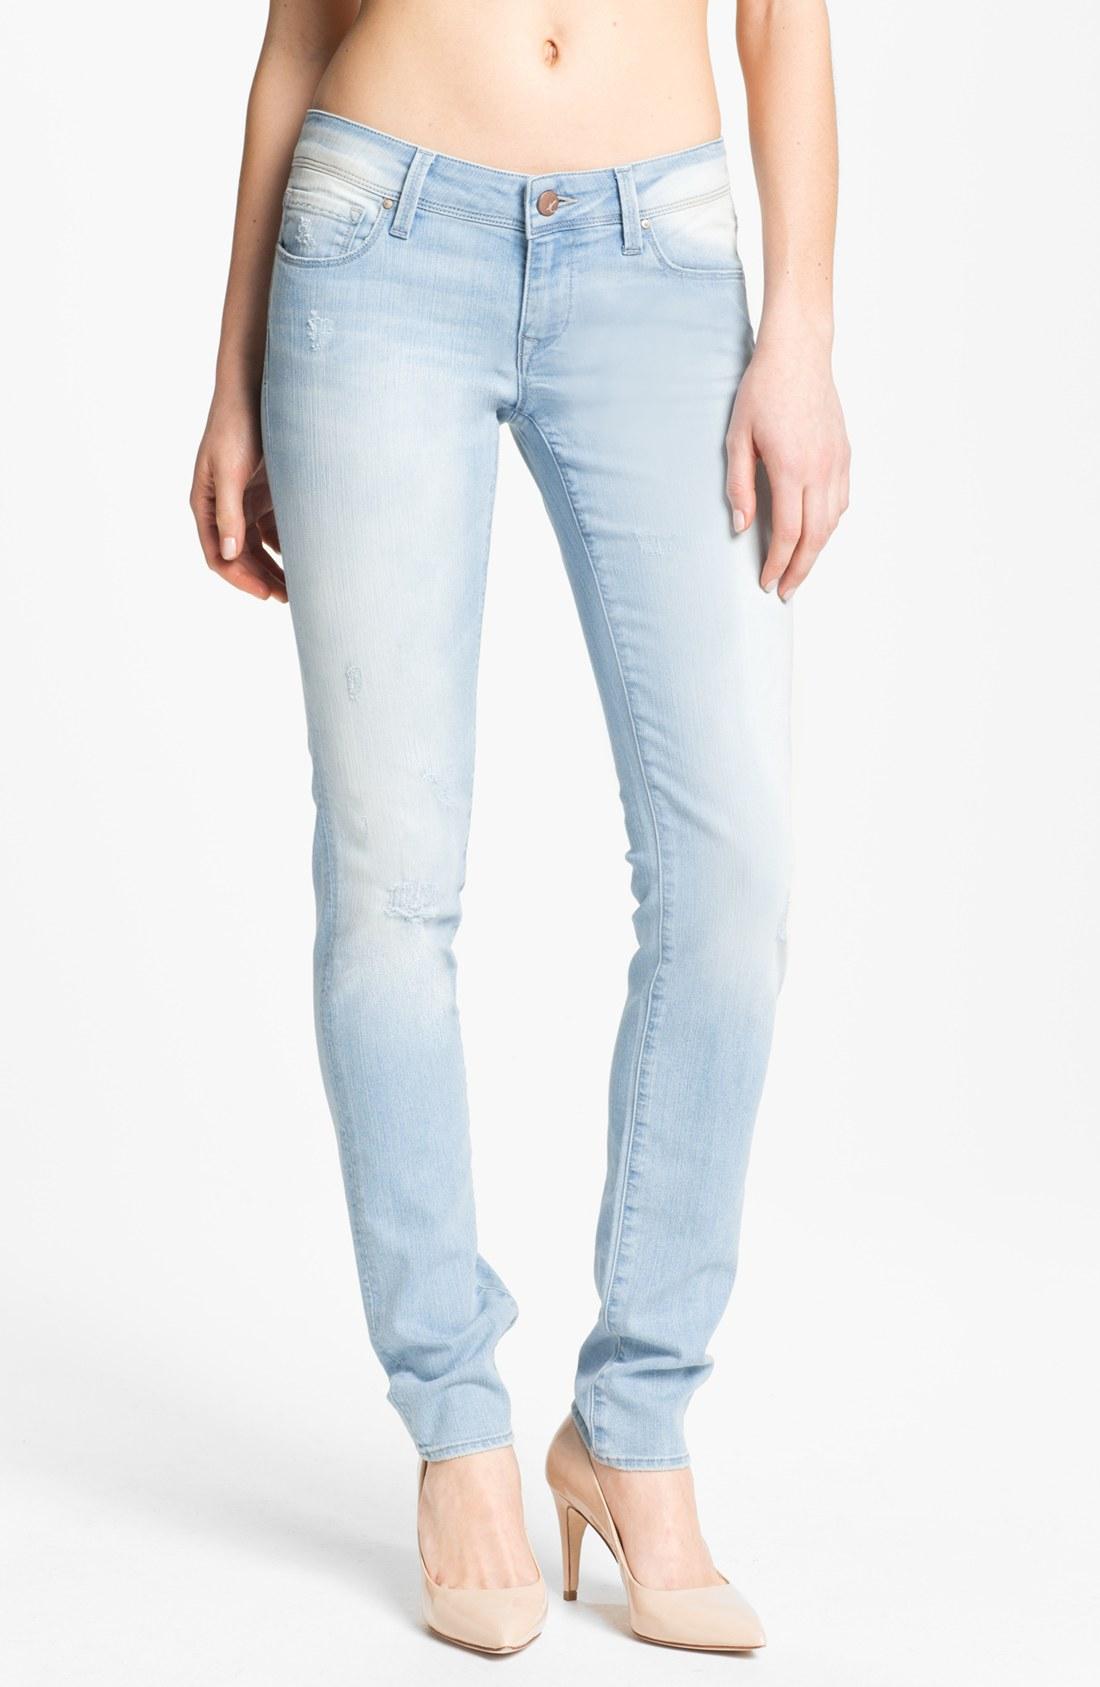 True Religion Jeans For Women Cheap